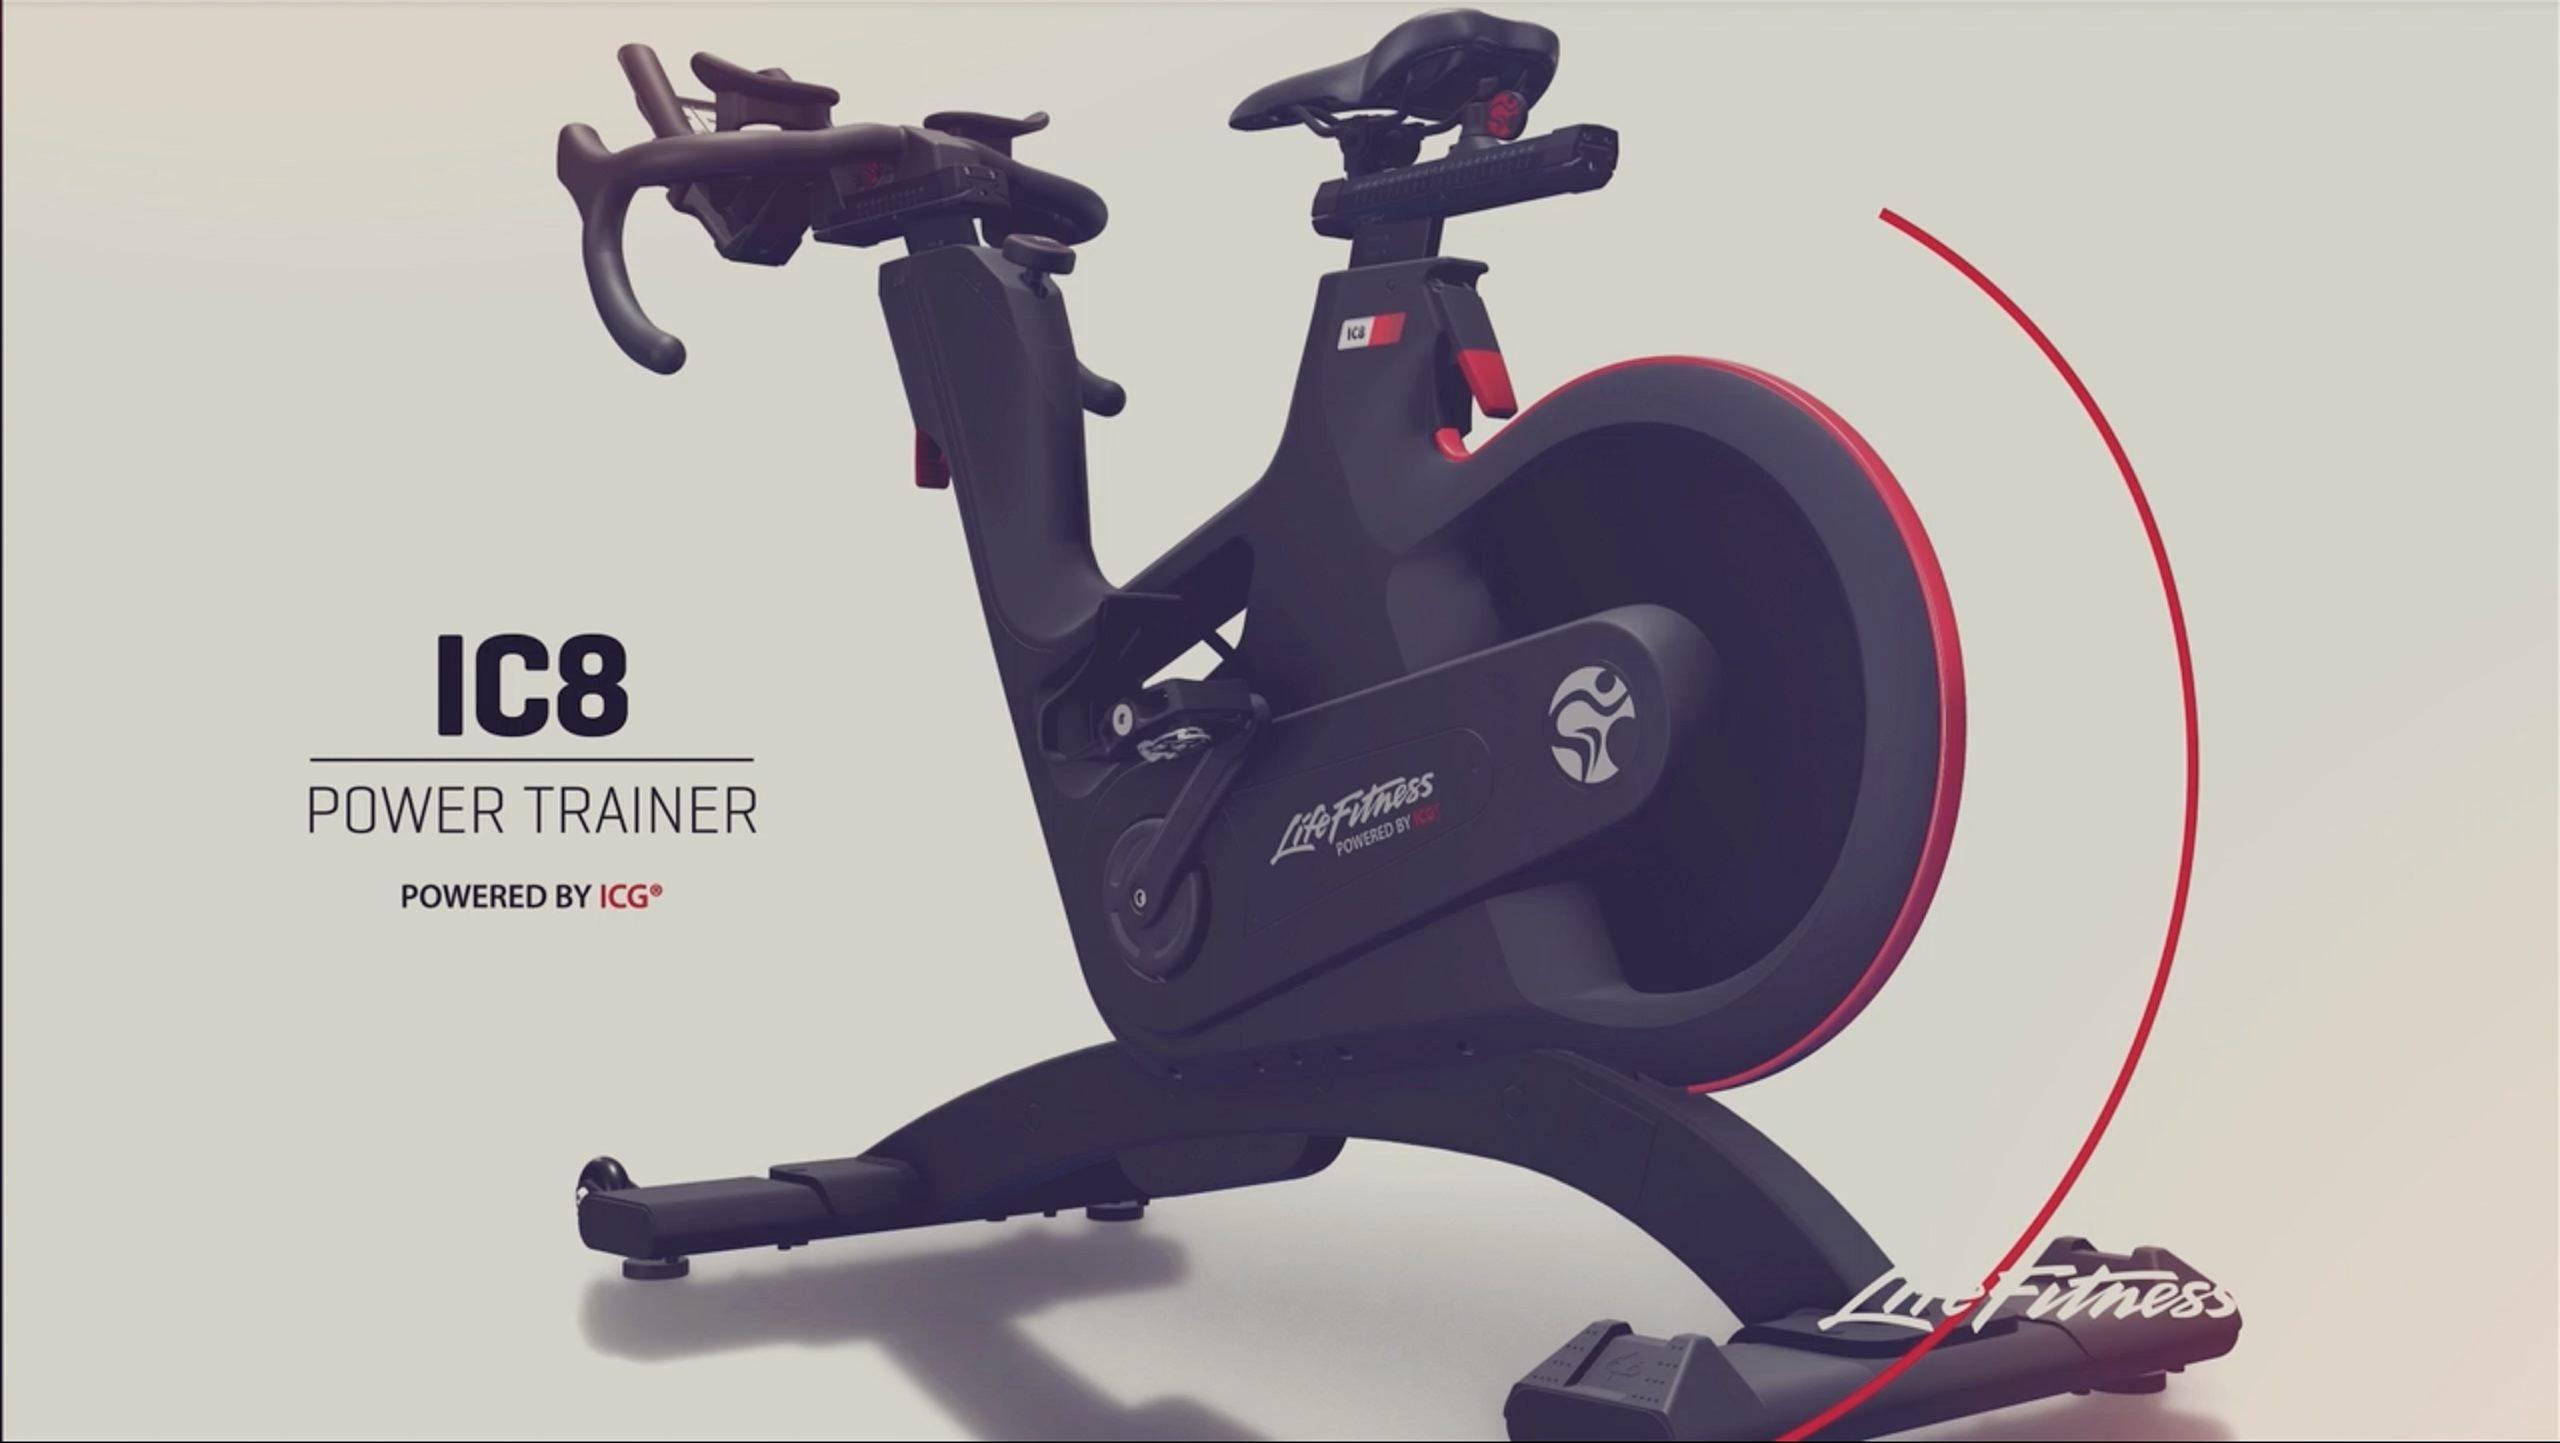 Life Fitness New Product Presentation Movie